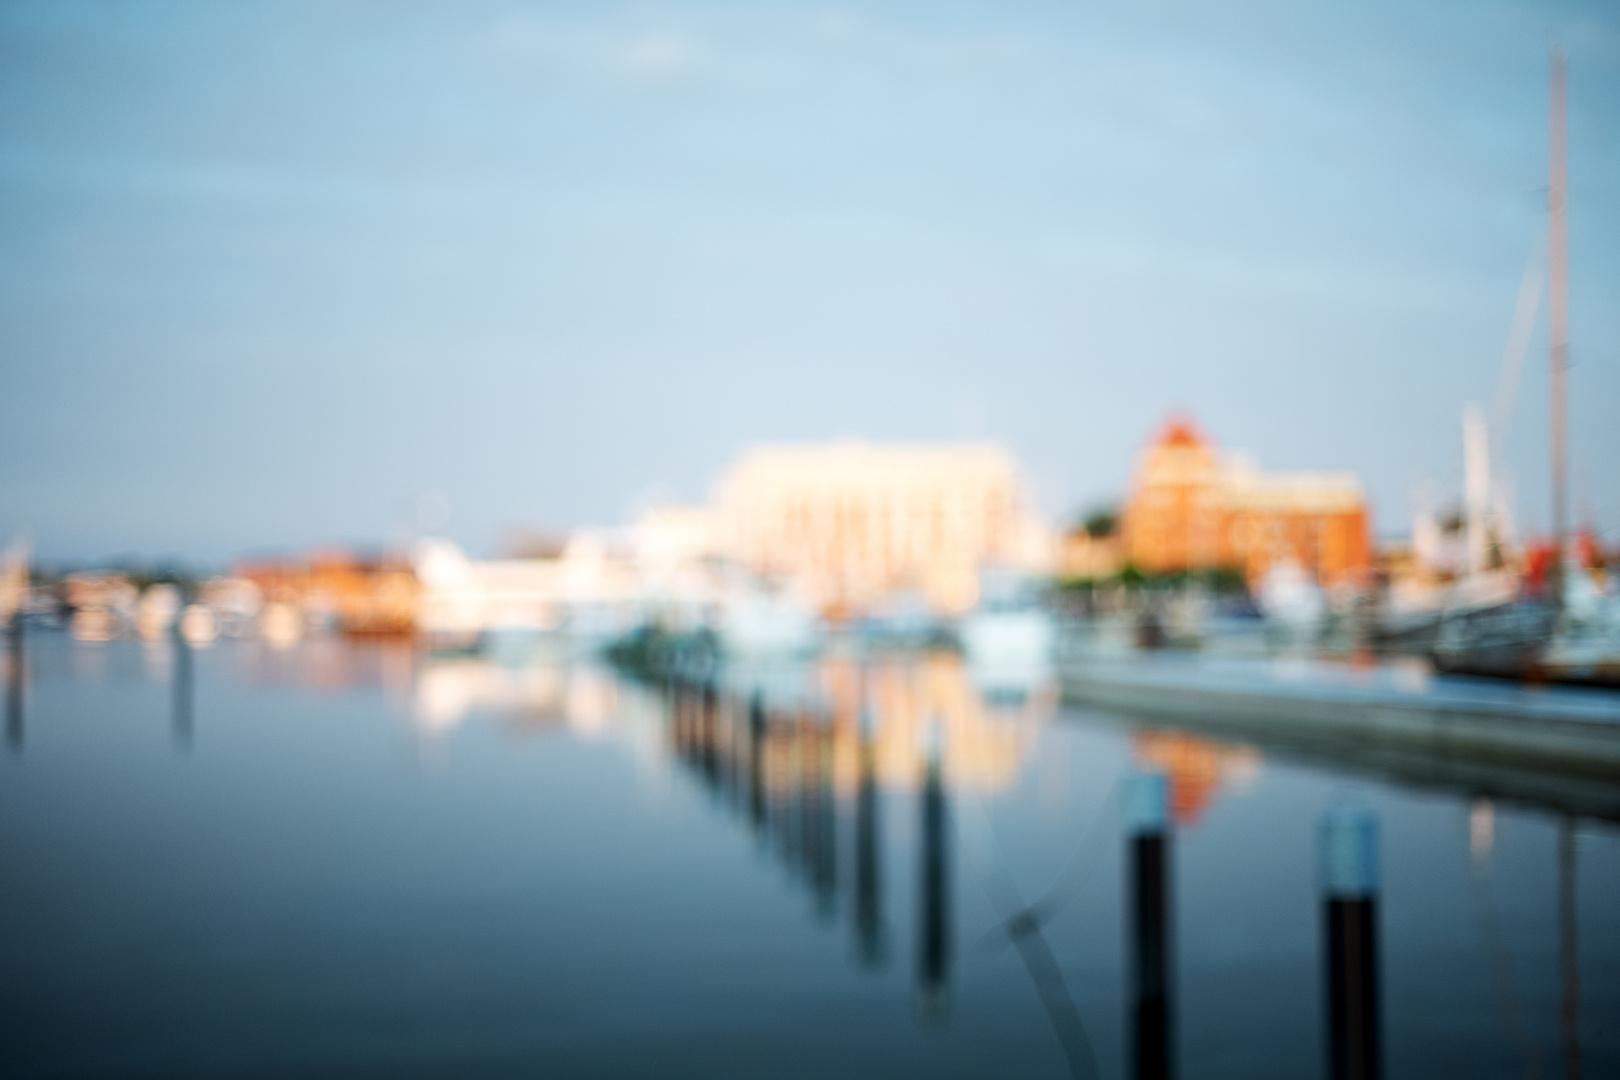 Sommeranfang am Barther Hafen